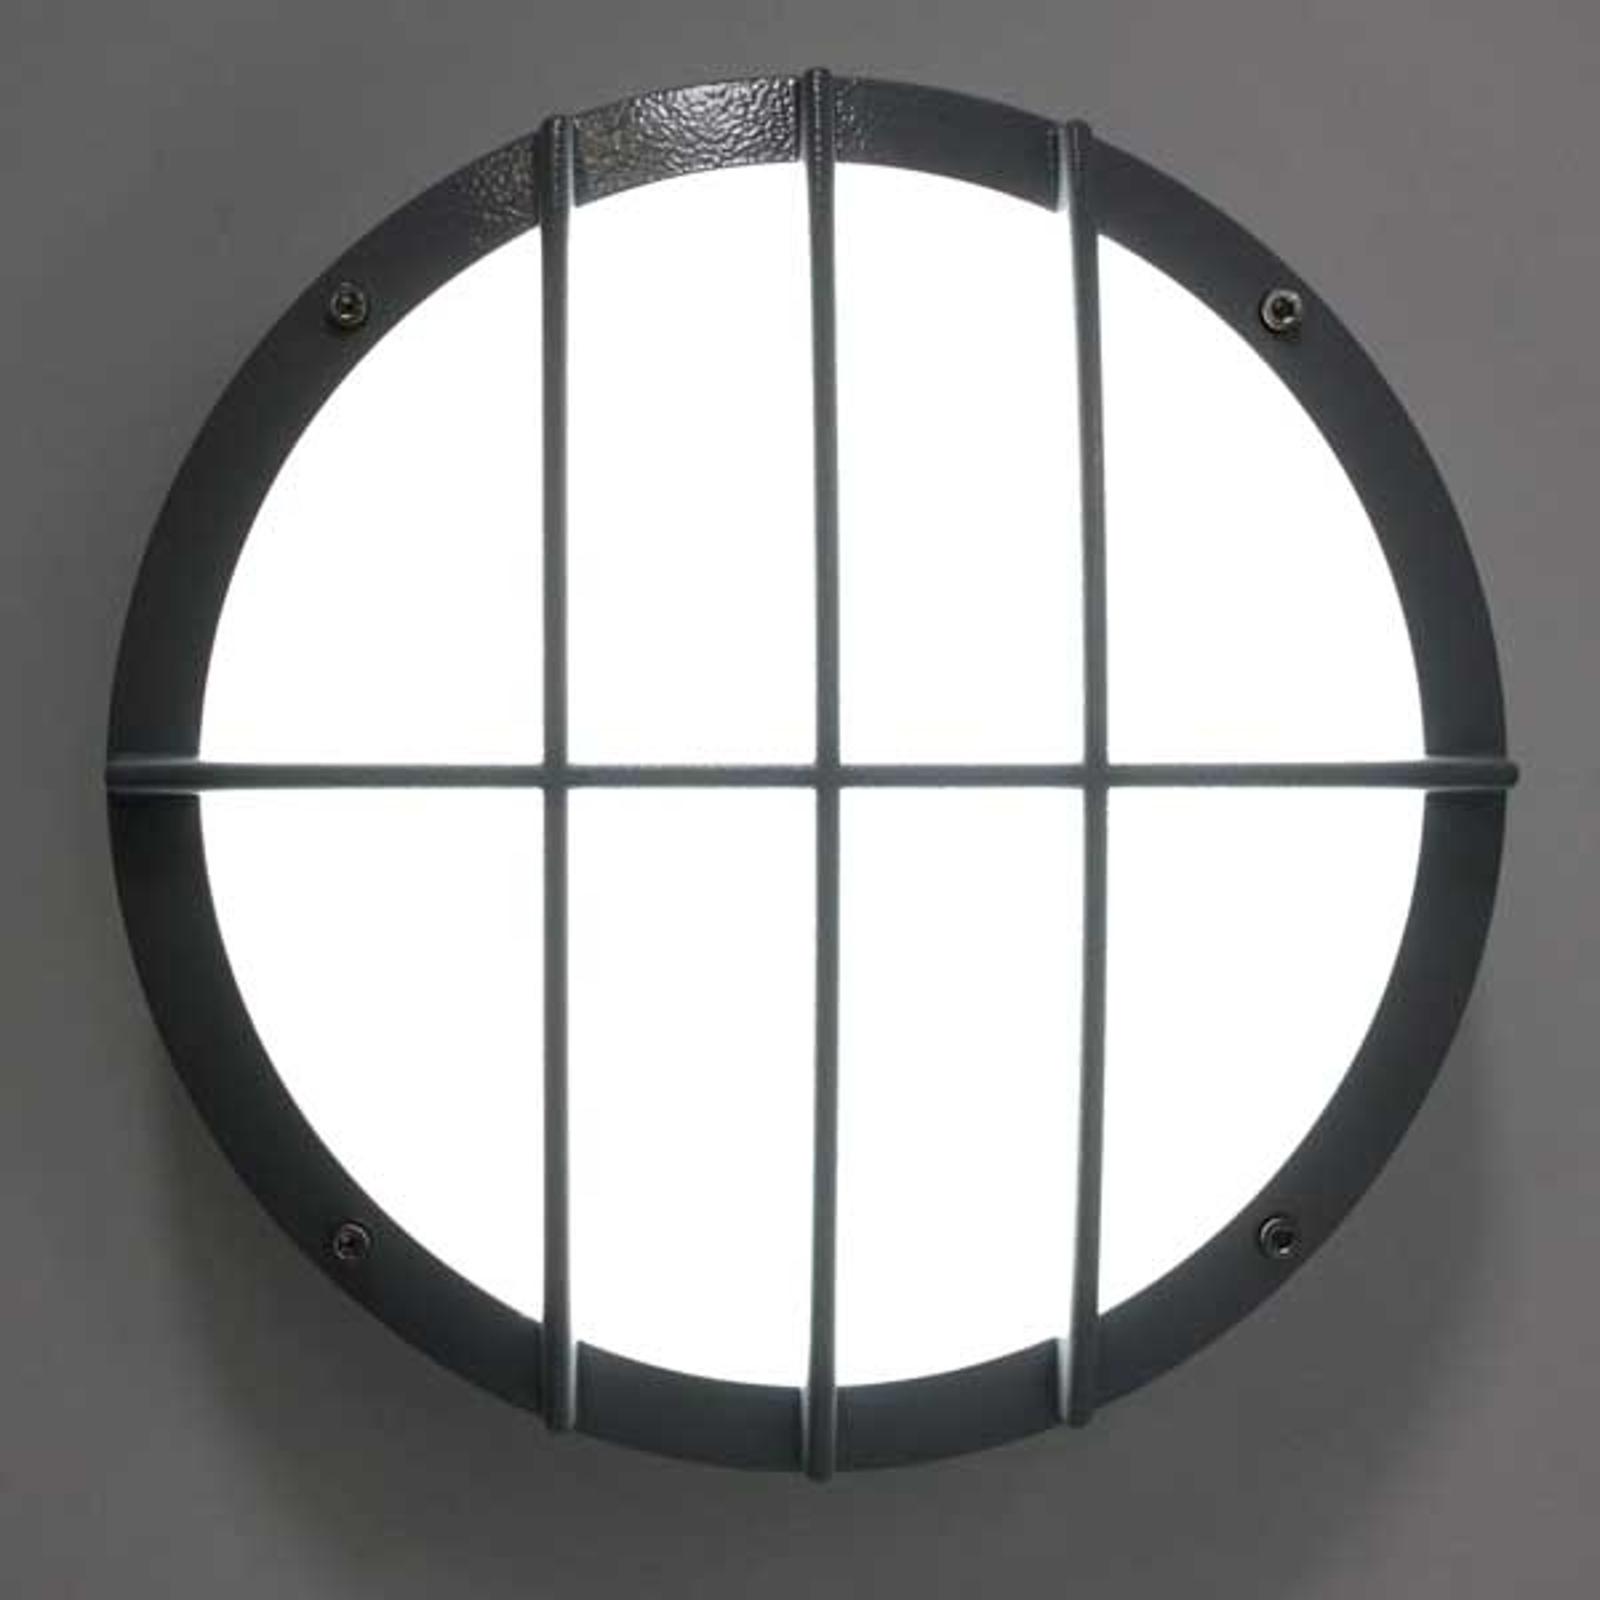 SUN 8 LED væglampe i trykstøbt aluminium 8 W 3K